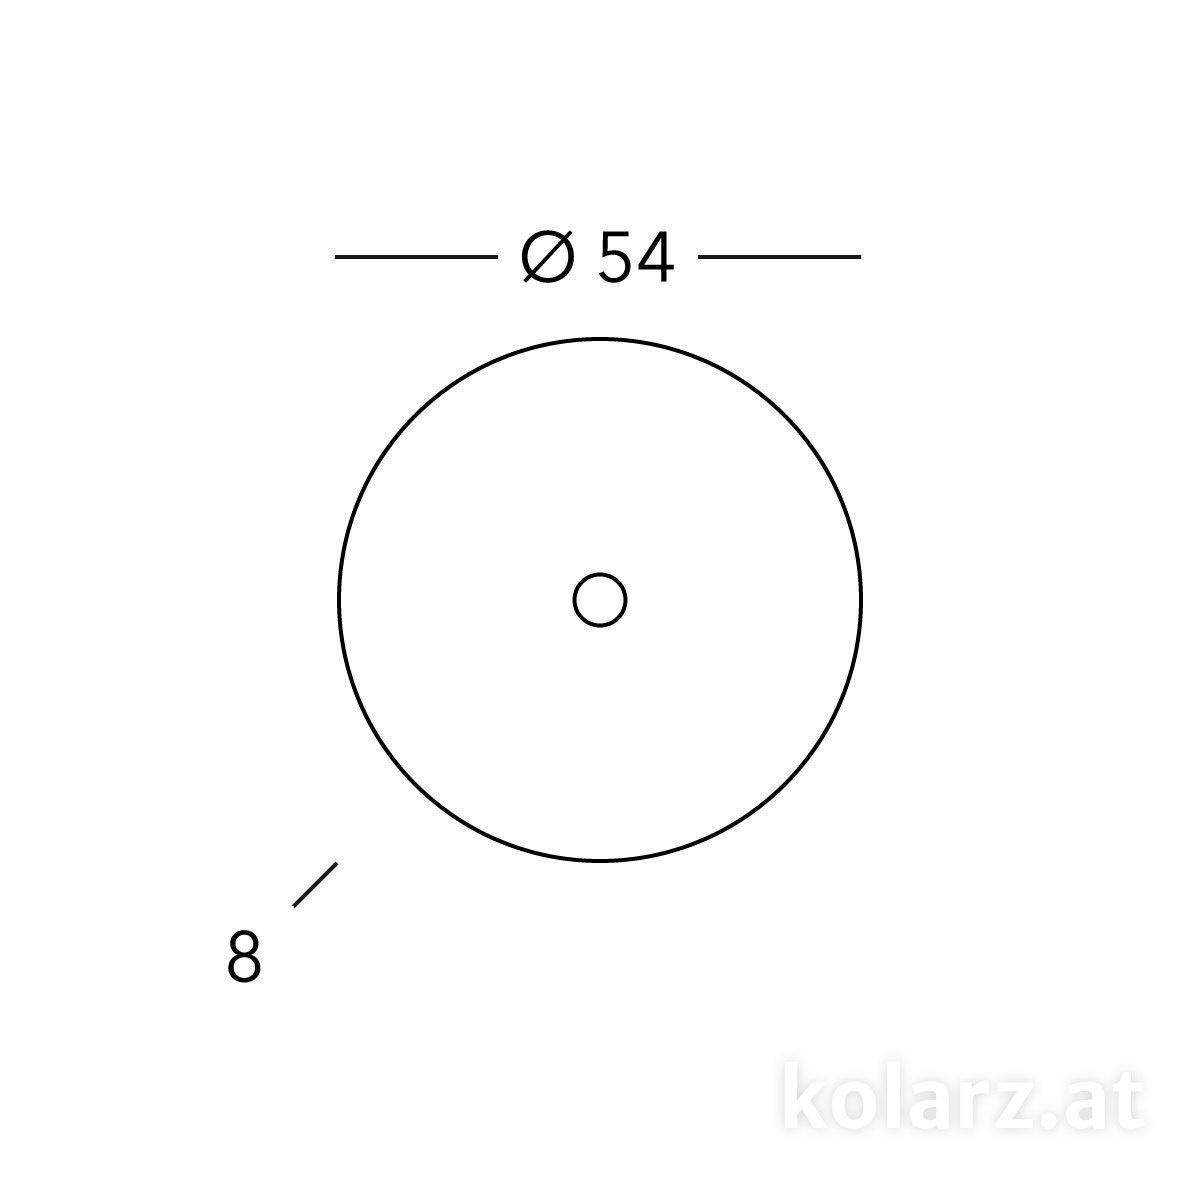 0314-U14-5-W-s1.jpg